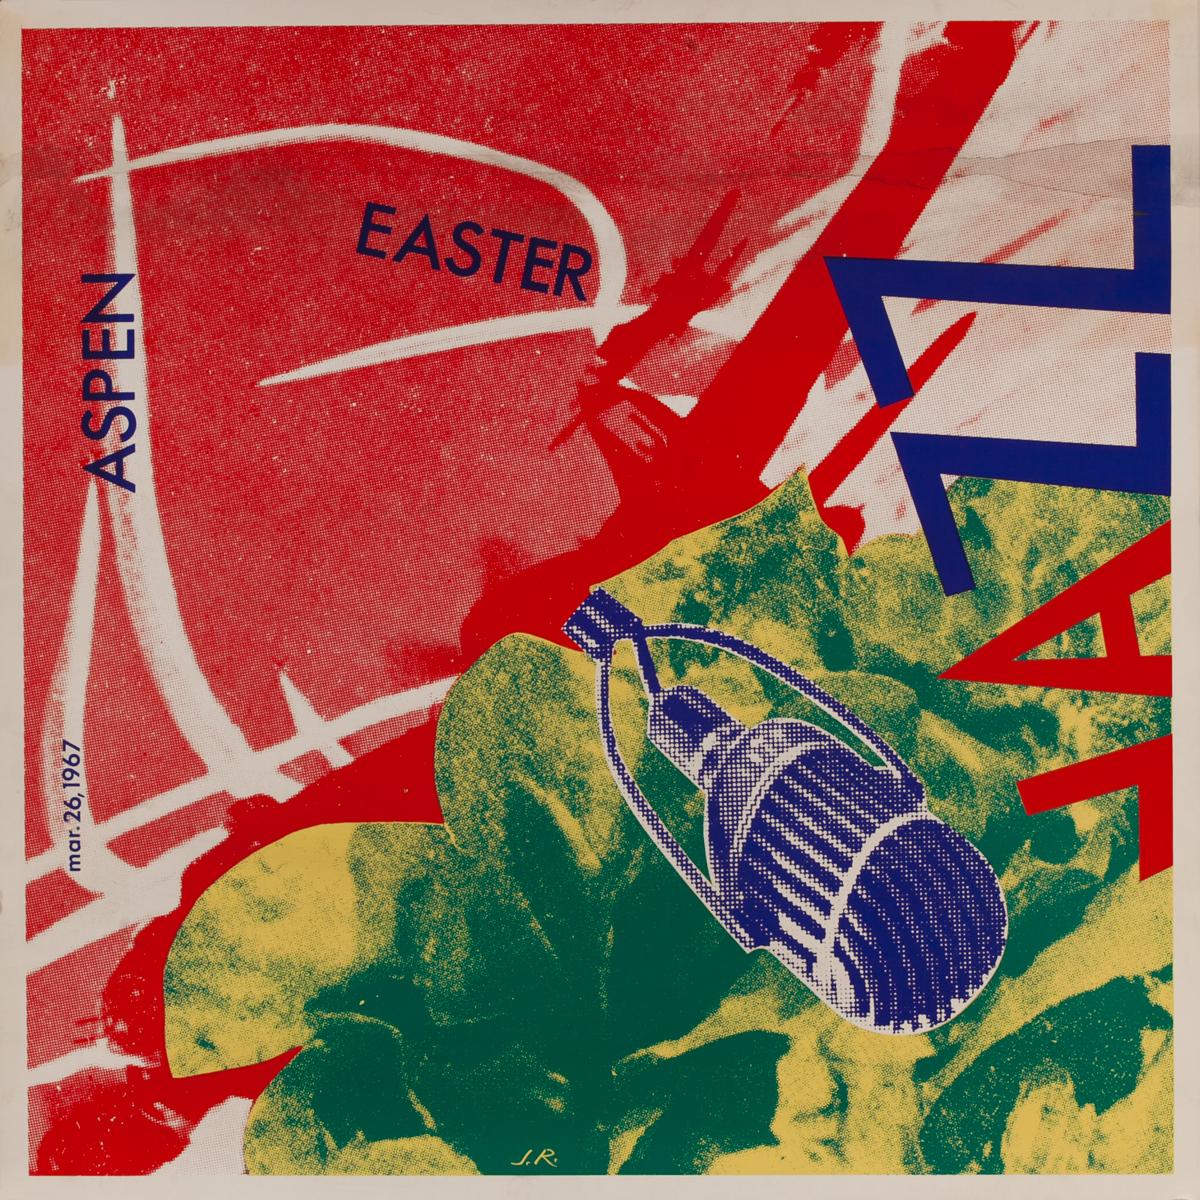 Aspen Easter Jazz Original Poster